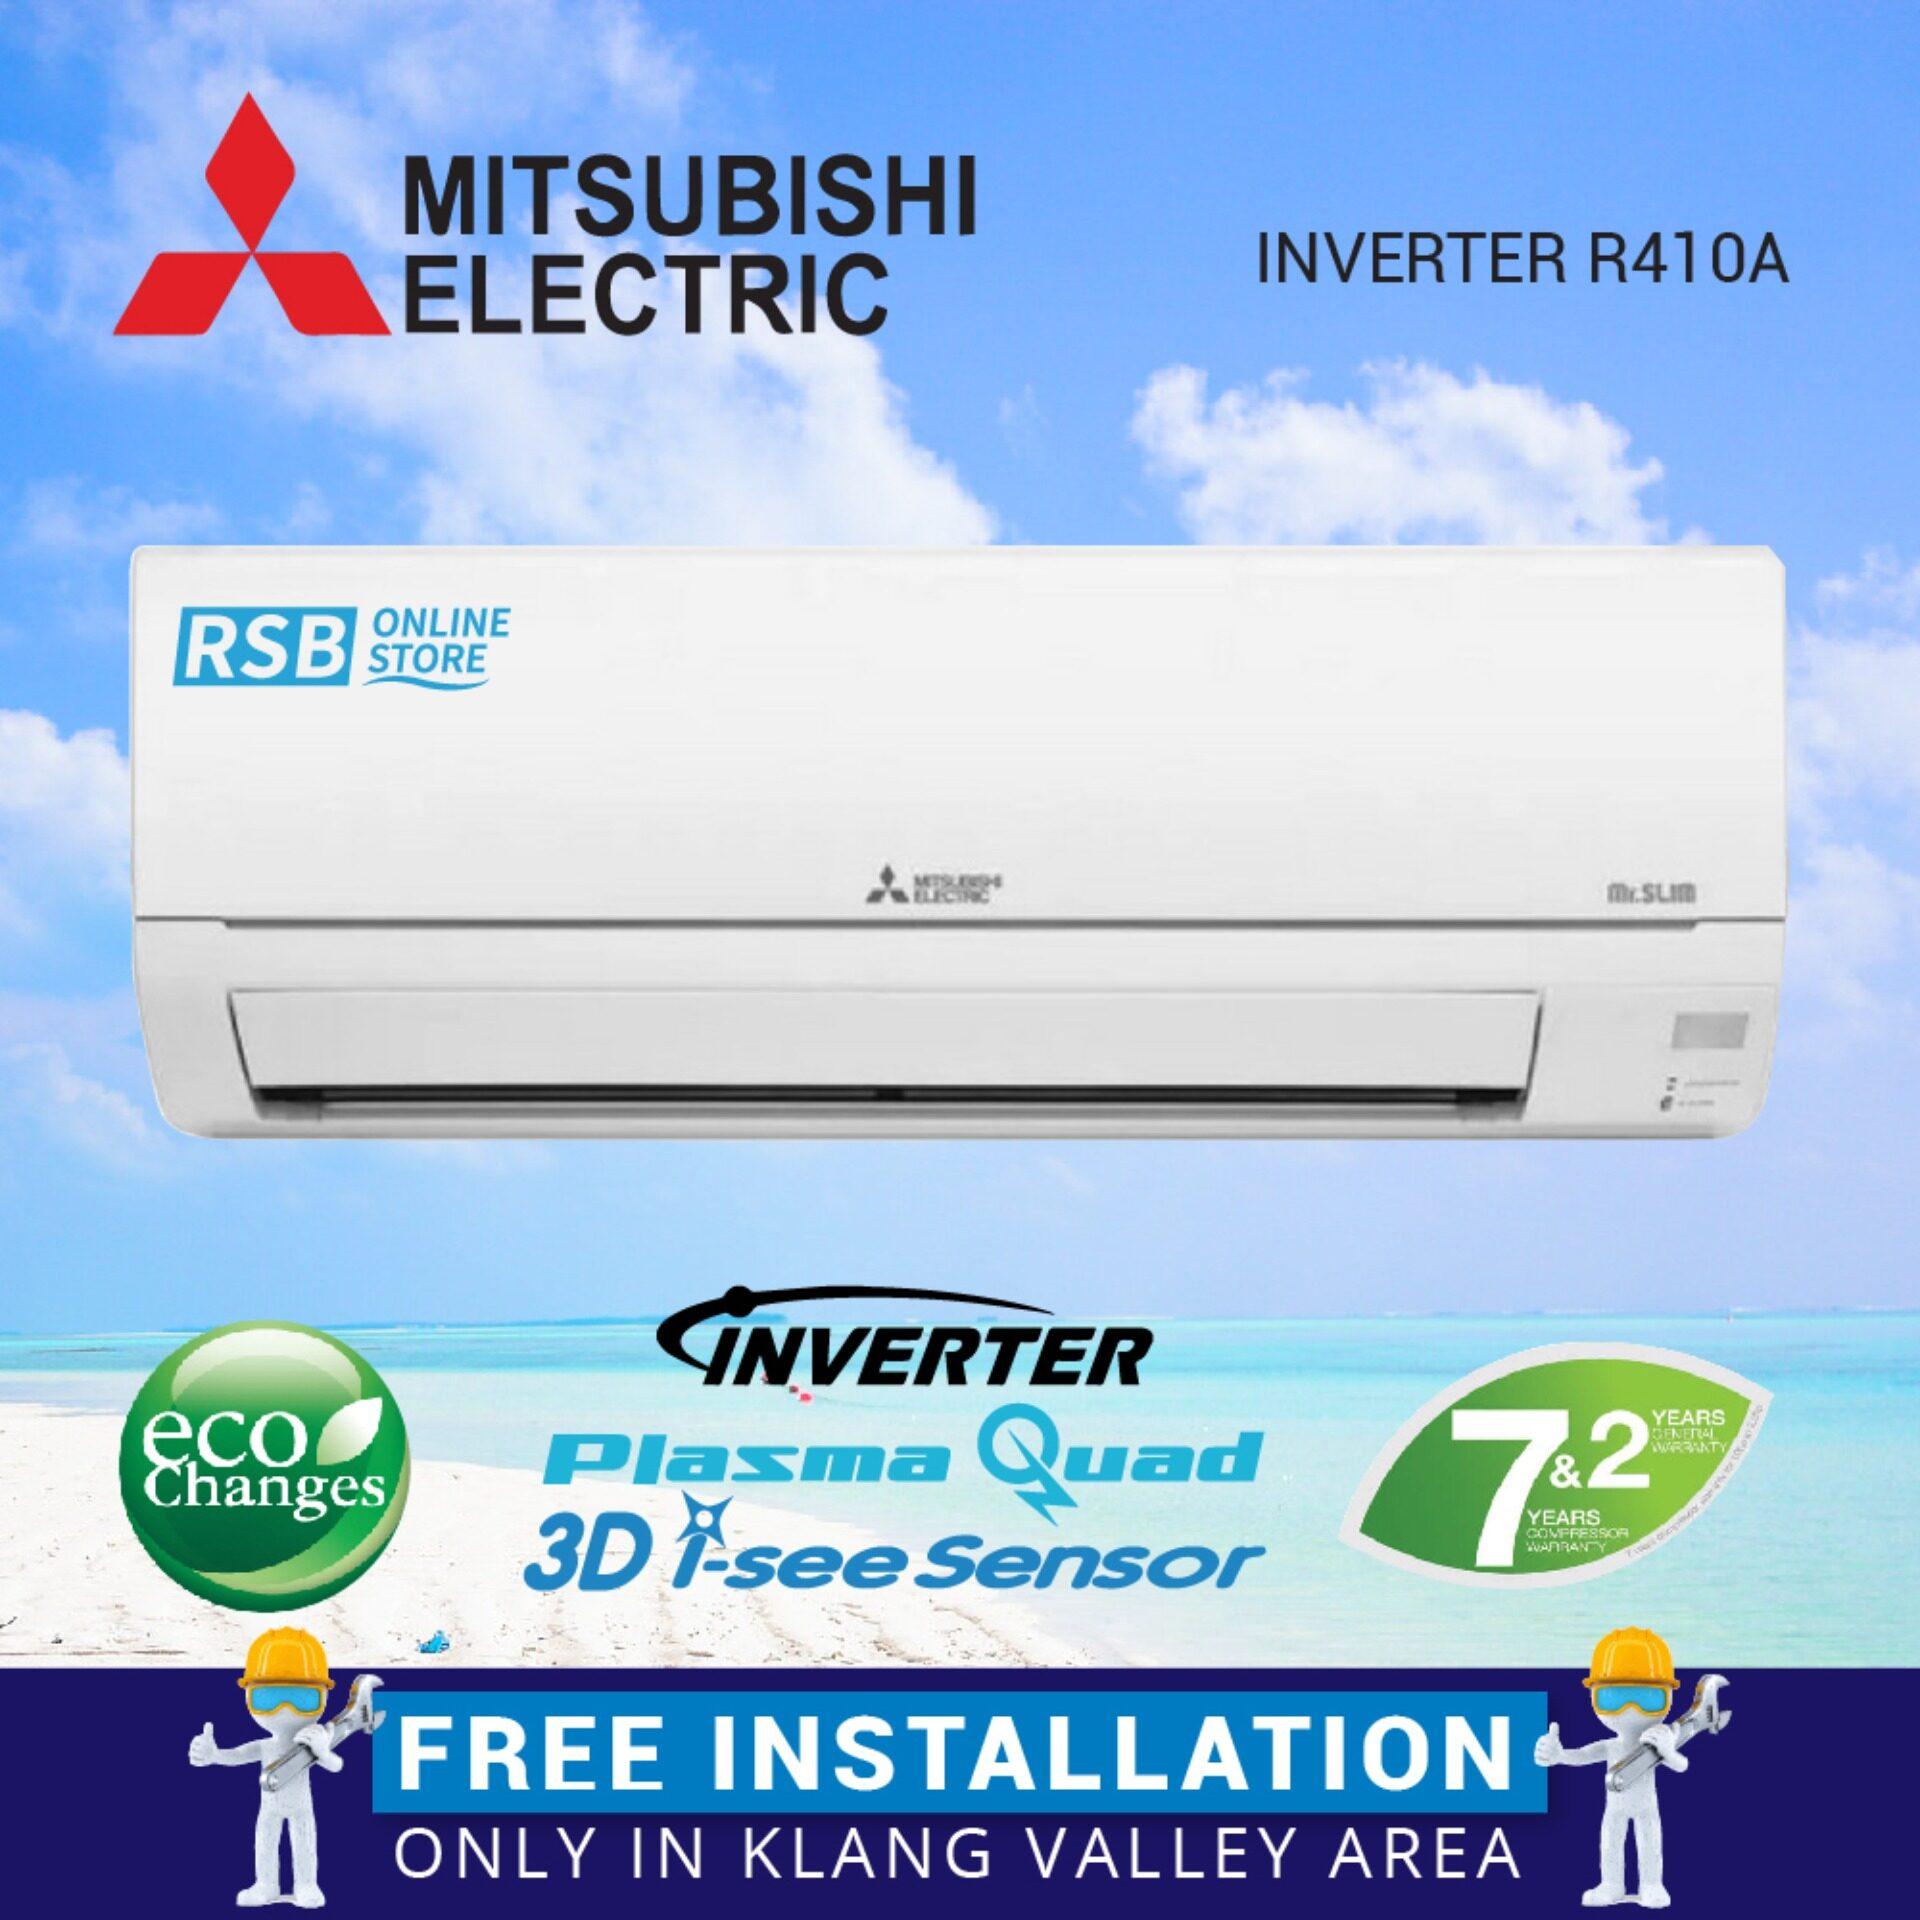 Free Installation Mitsubshi Air Conditioner Inverter R410A 1.0HP MSY-GJ10VA_FI + Eco Changes + Inverter + Plasma Quad 3D I-see Sensor + Mr.Slim